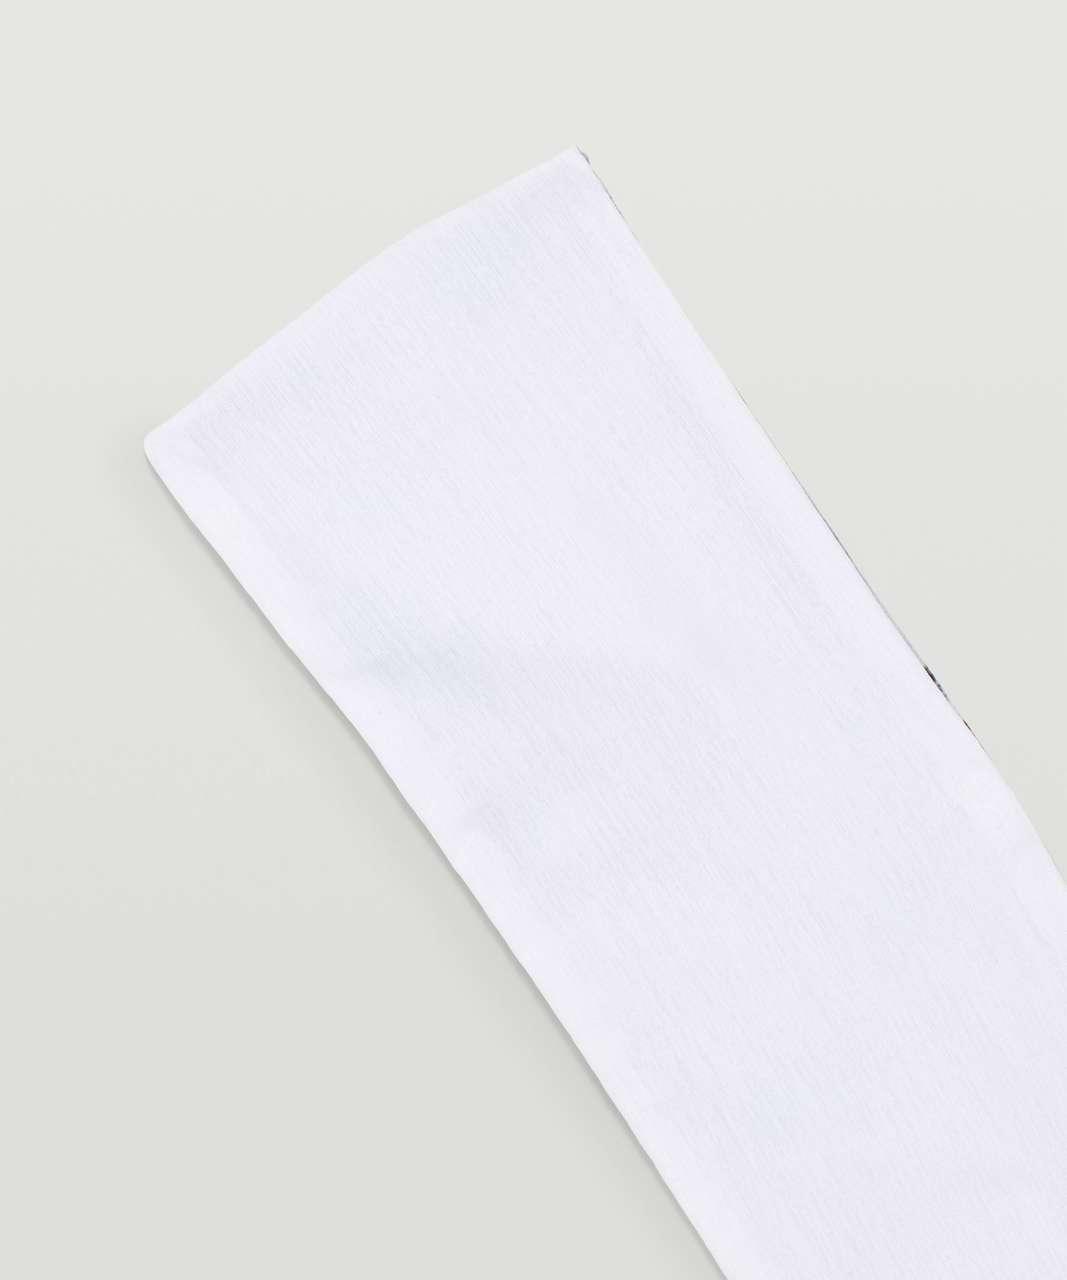 Lululemon Fringe Fighter Headband - Kaleidofloral Multi / White